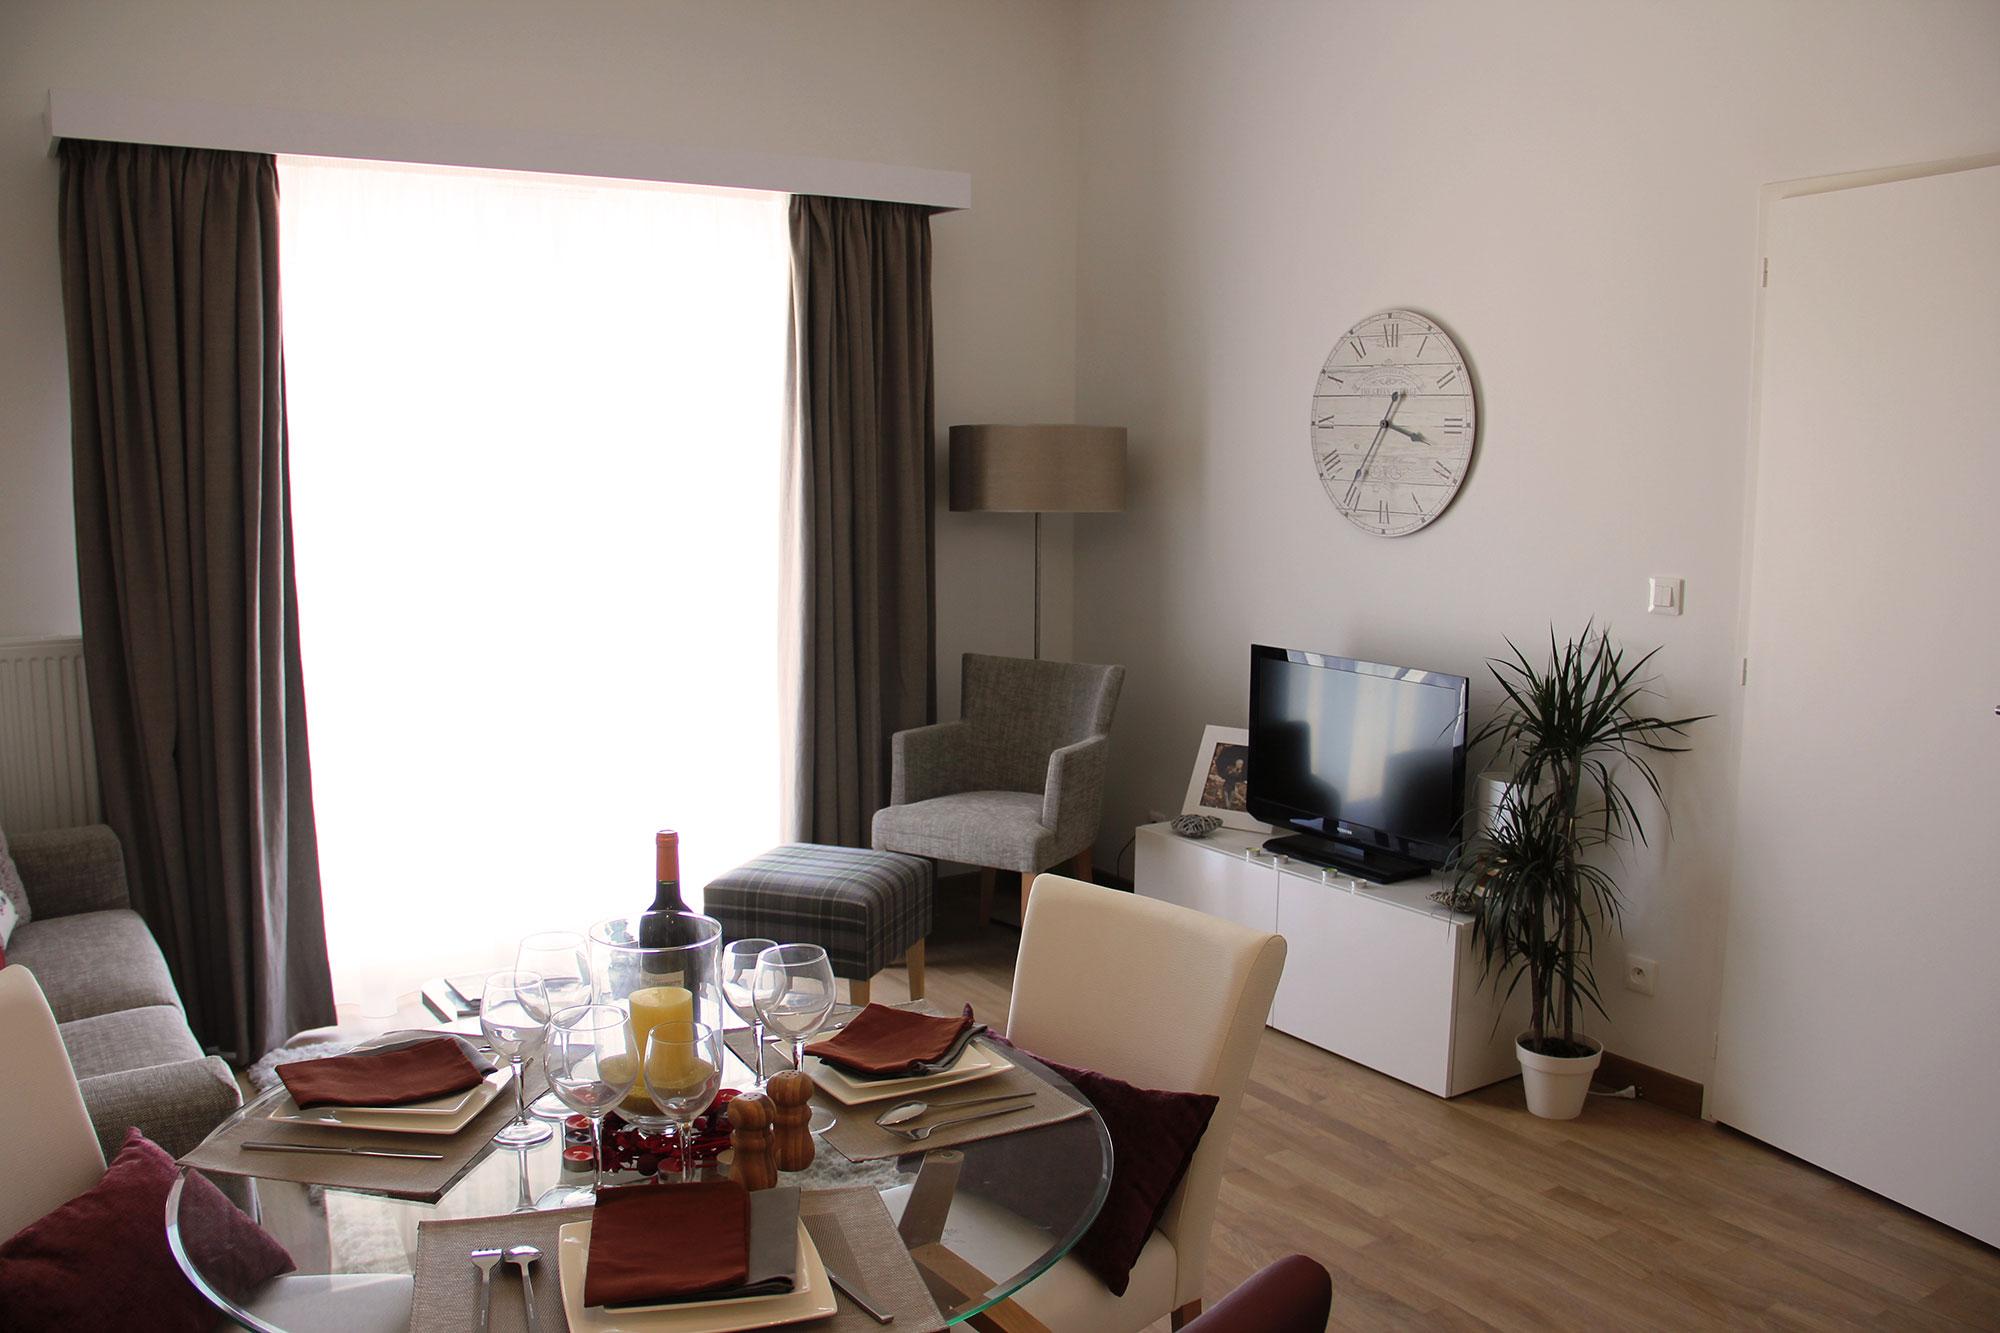 r sidence service cogedim club r sidence arpitania residence avec services pour personnes. Black Bedroom Furniture Sets. Home Design Ideas